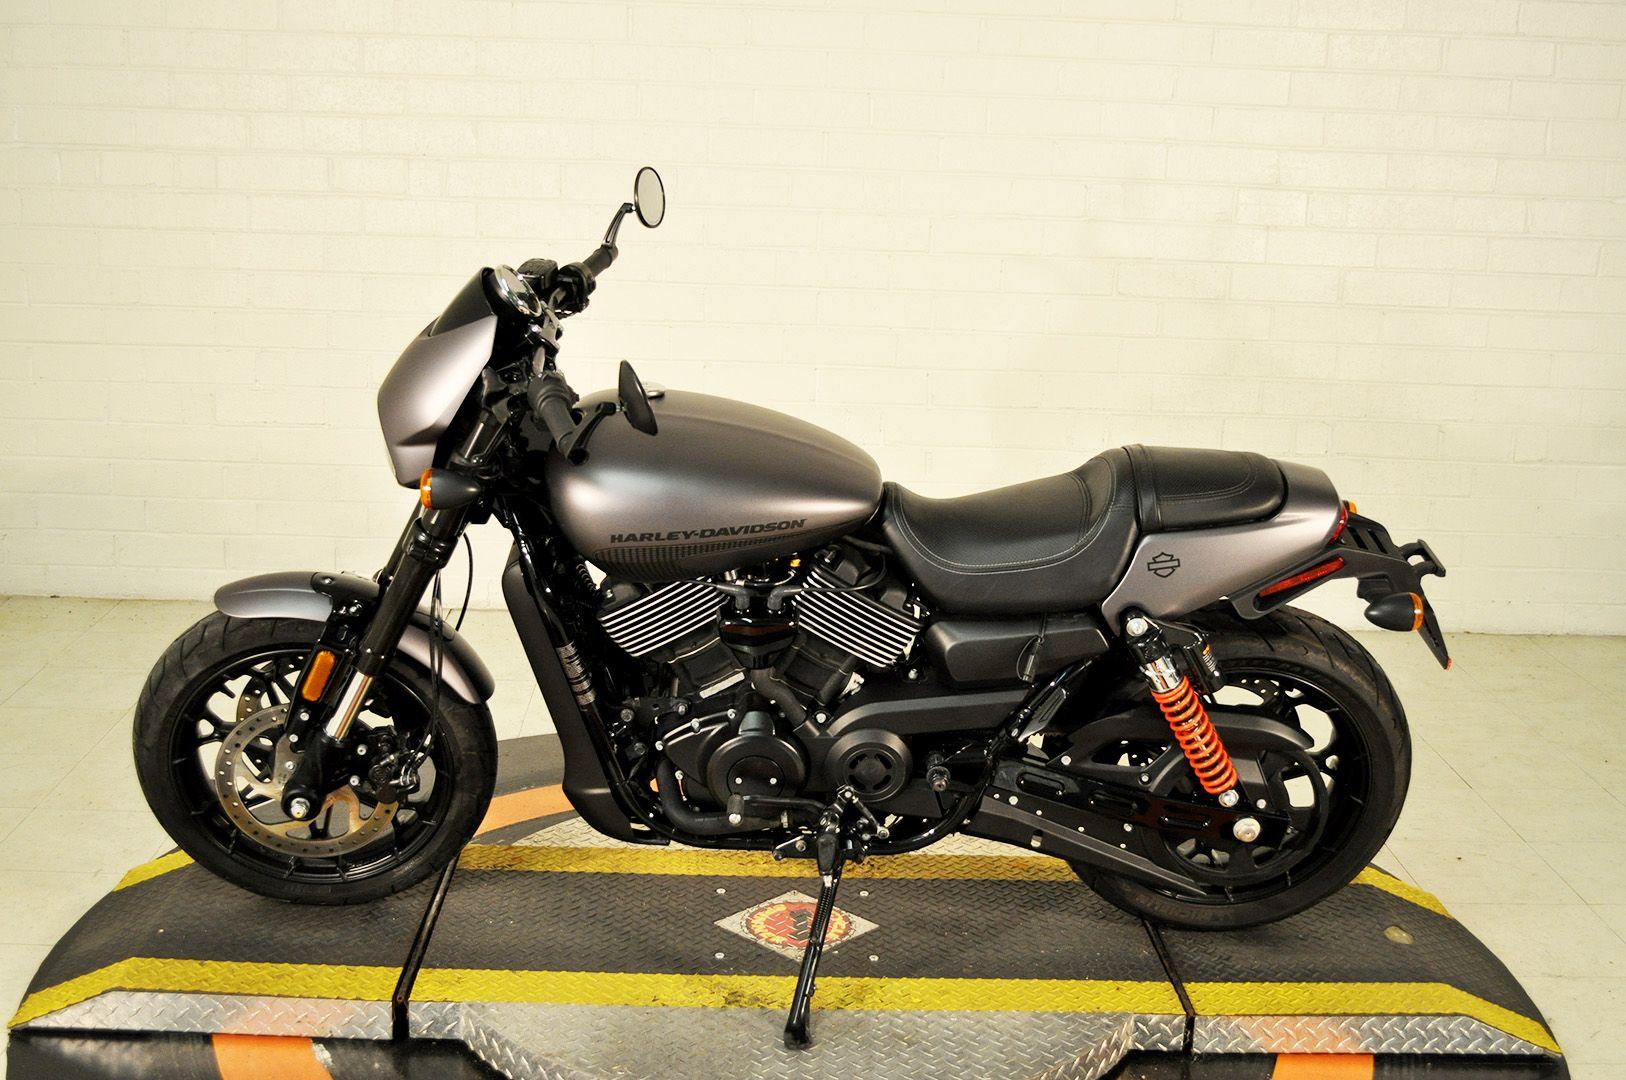 Pre-Owned 2017 Harley-Davidson Street Rod